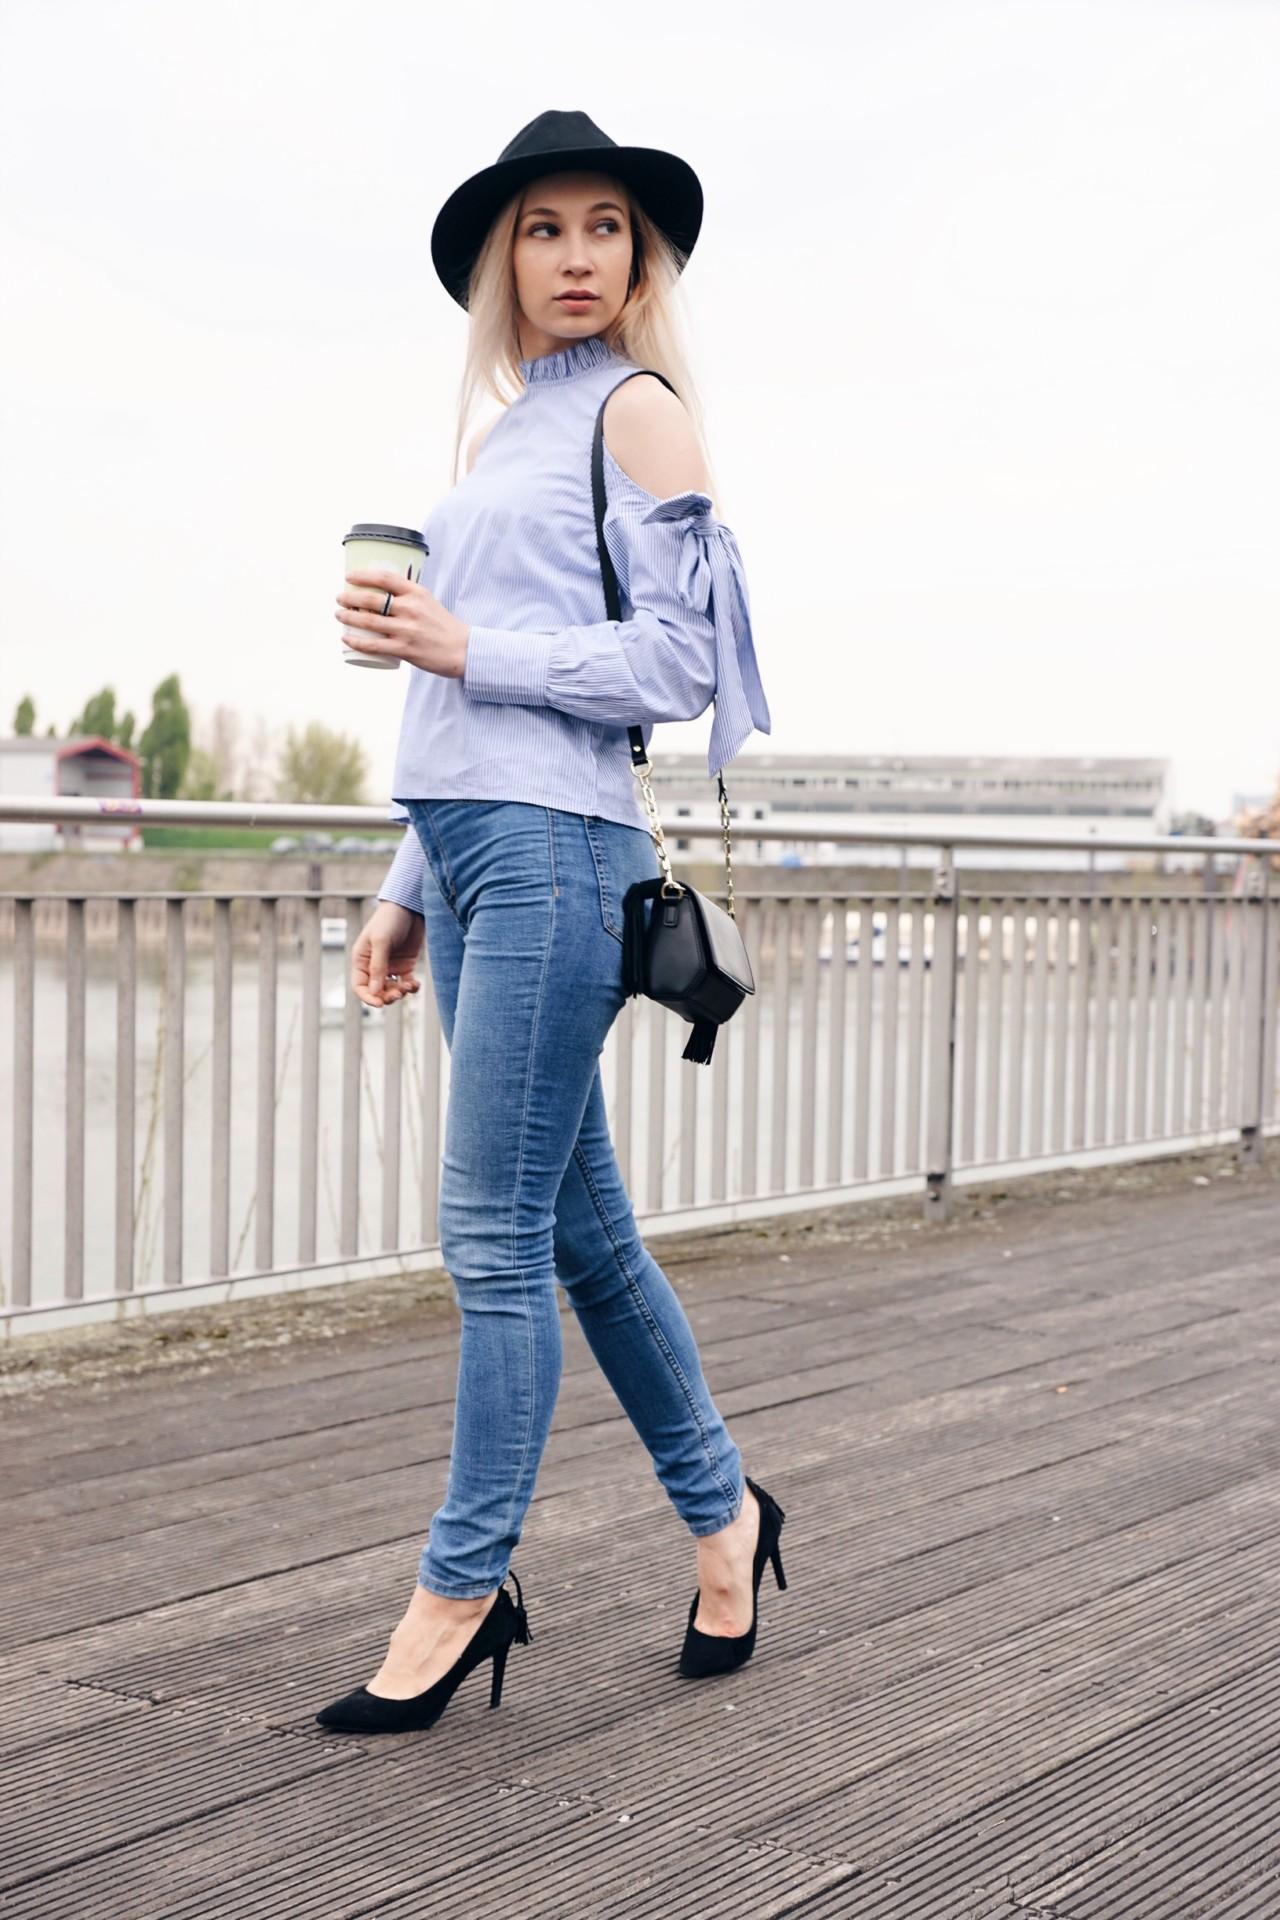 bluse_shein_stretstyle_mode_fashion_maje_dbkstylez_fashion_inspiration_bestblog_мода_стиль